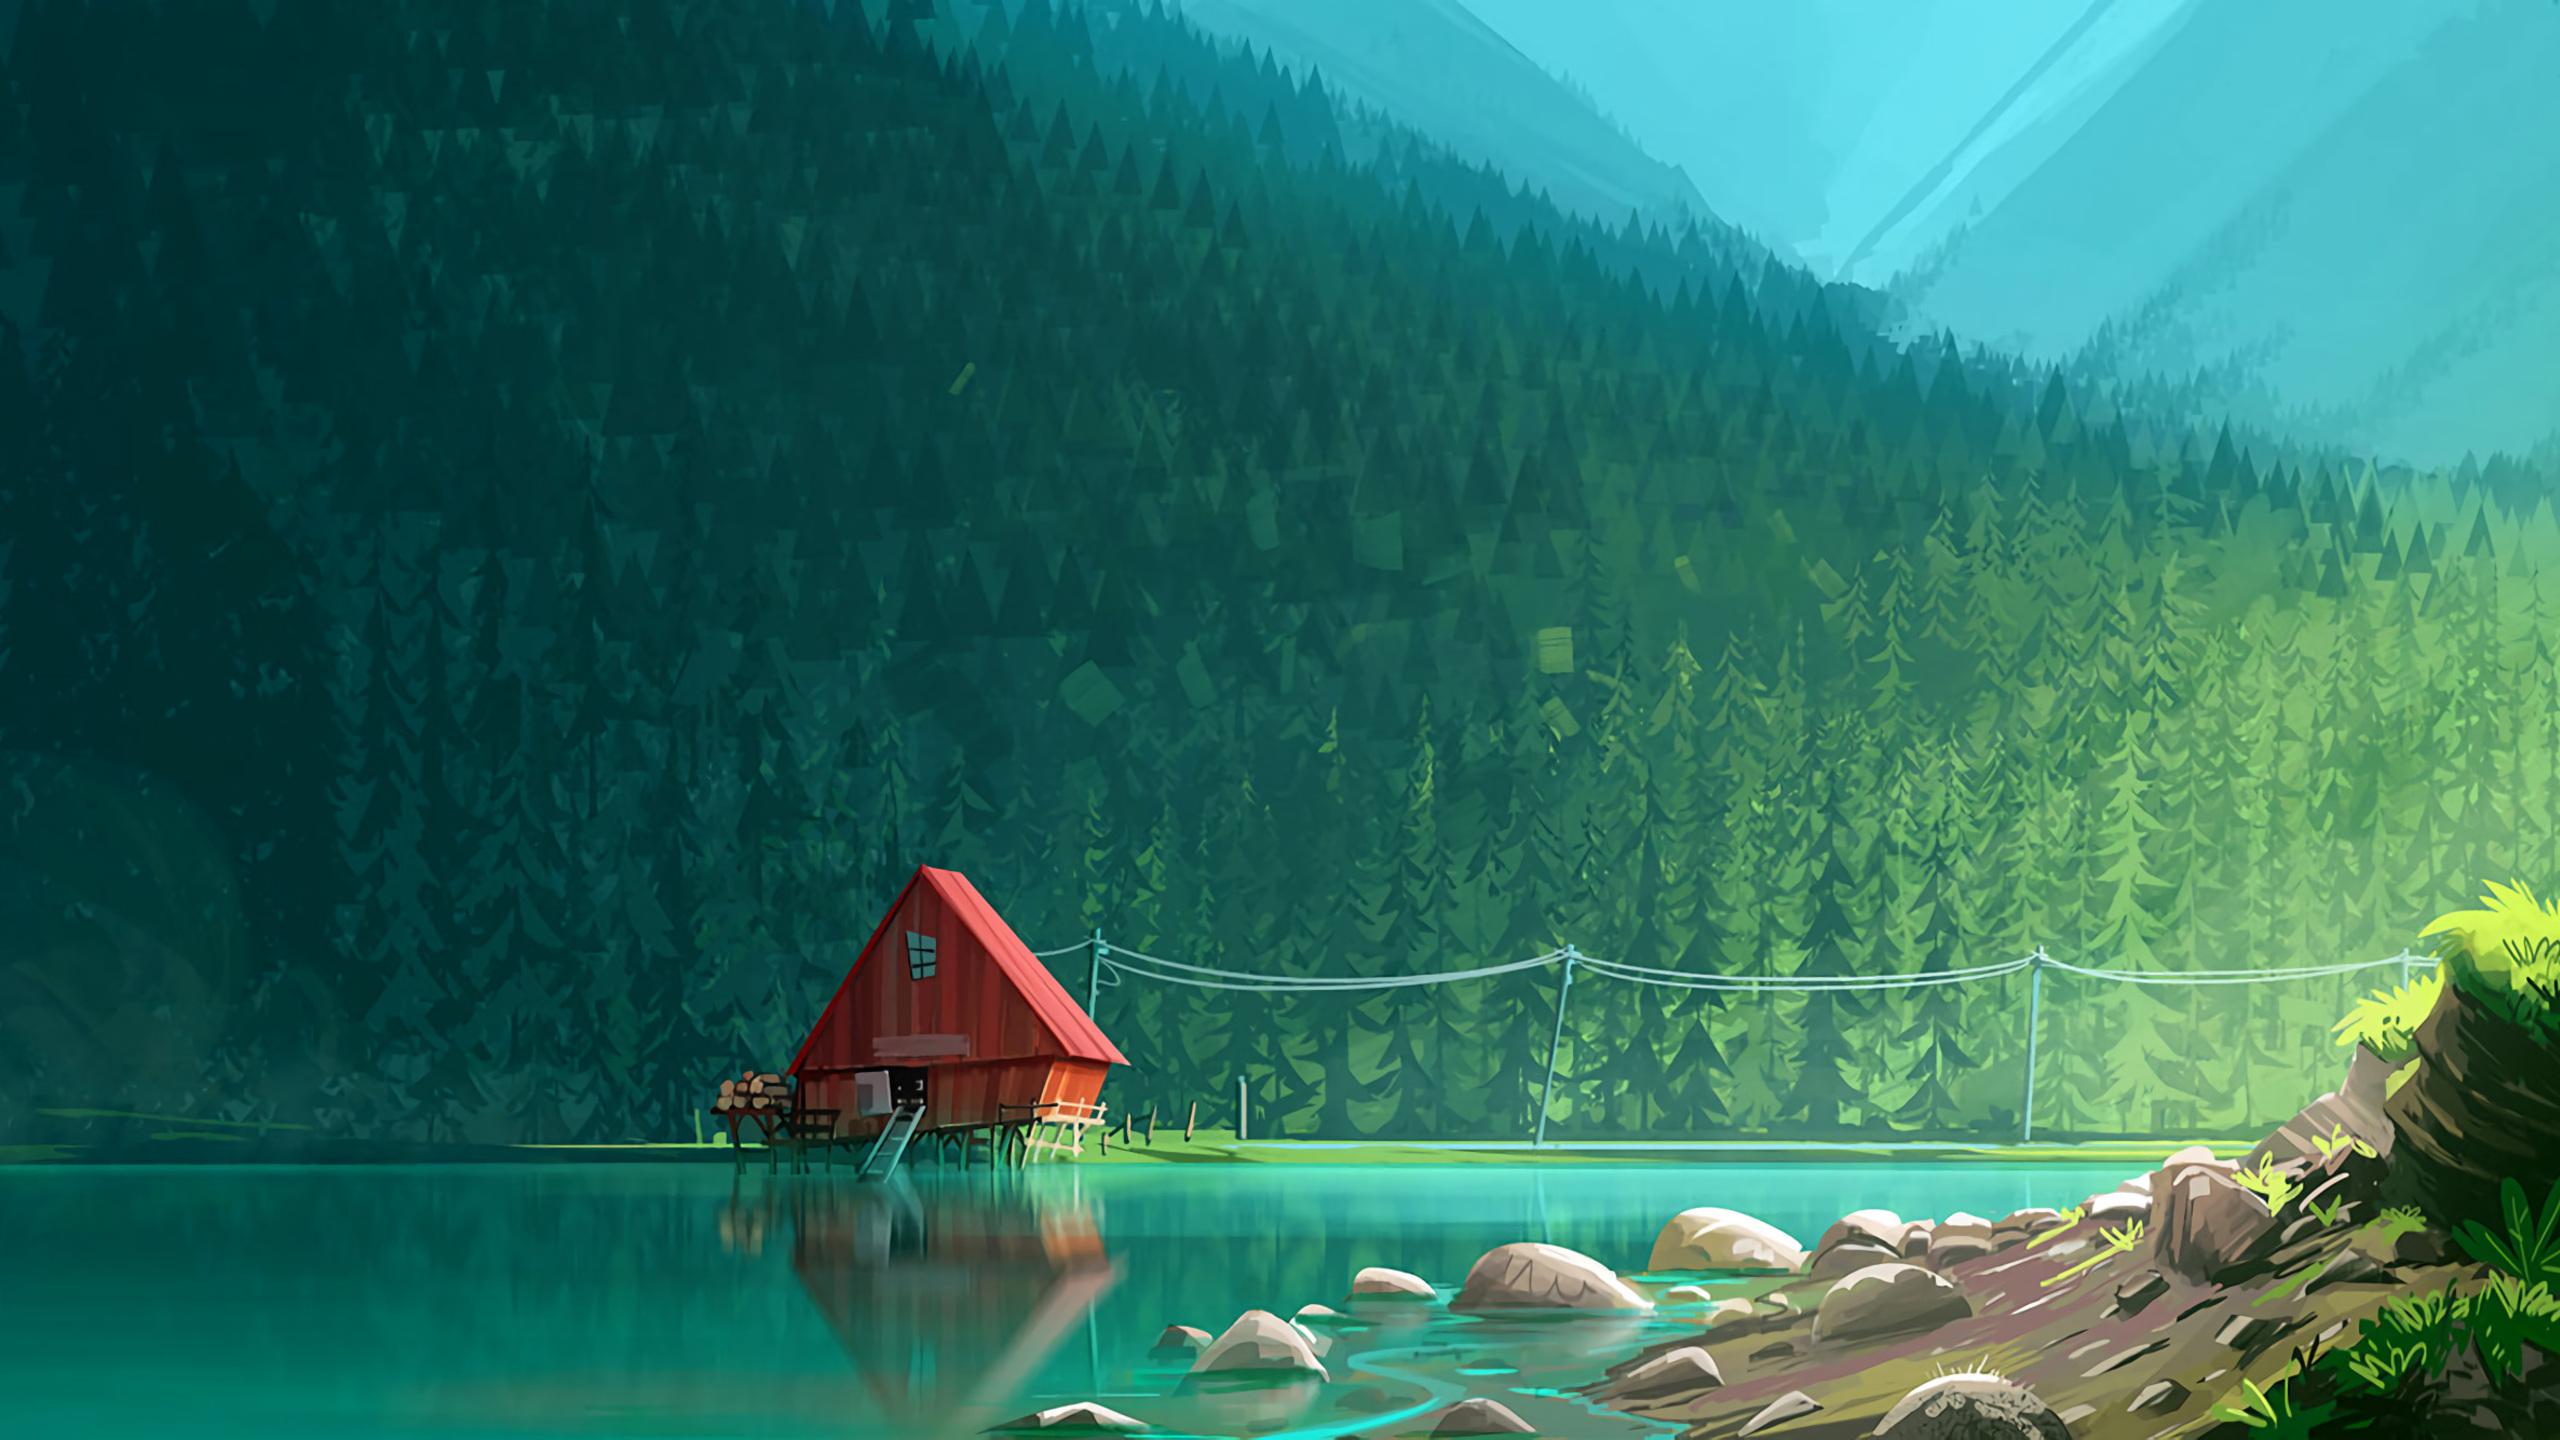 2560x1440 house in woods minimalism artwork 1440p resolution hd 4k